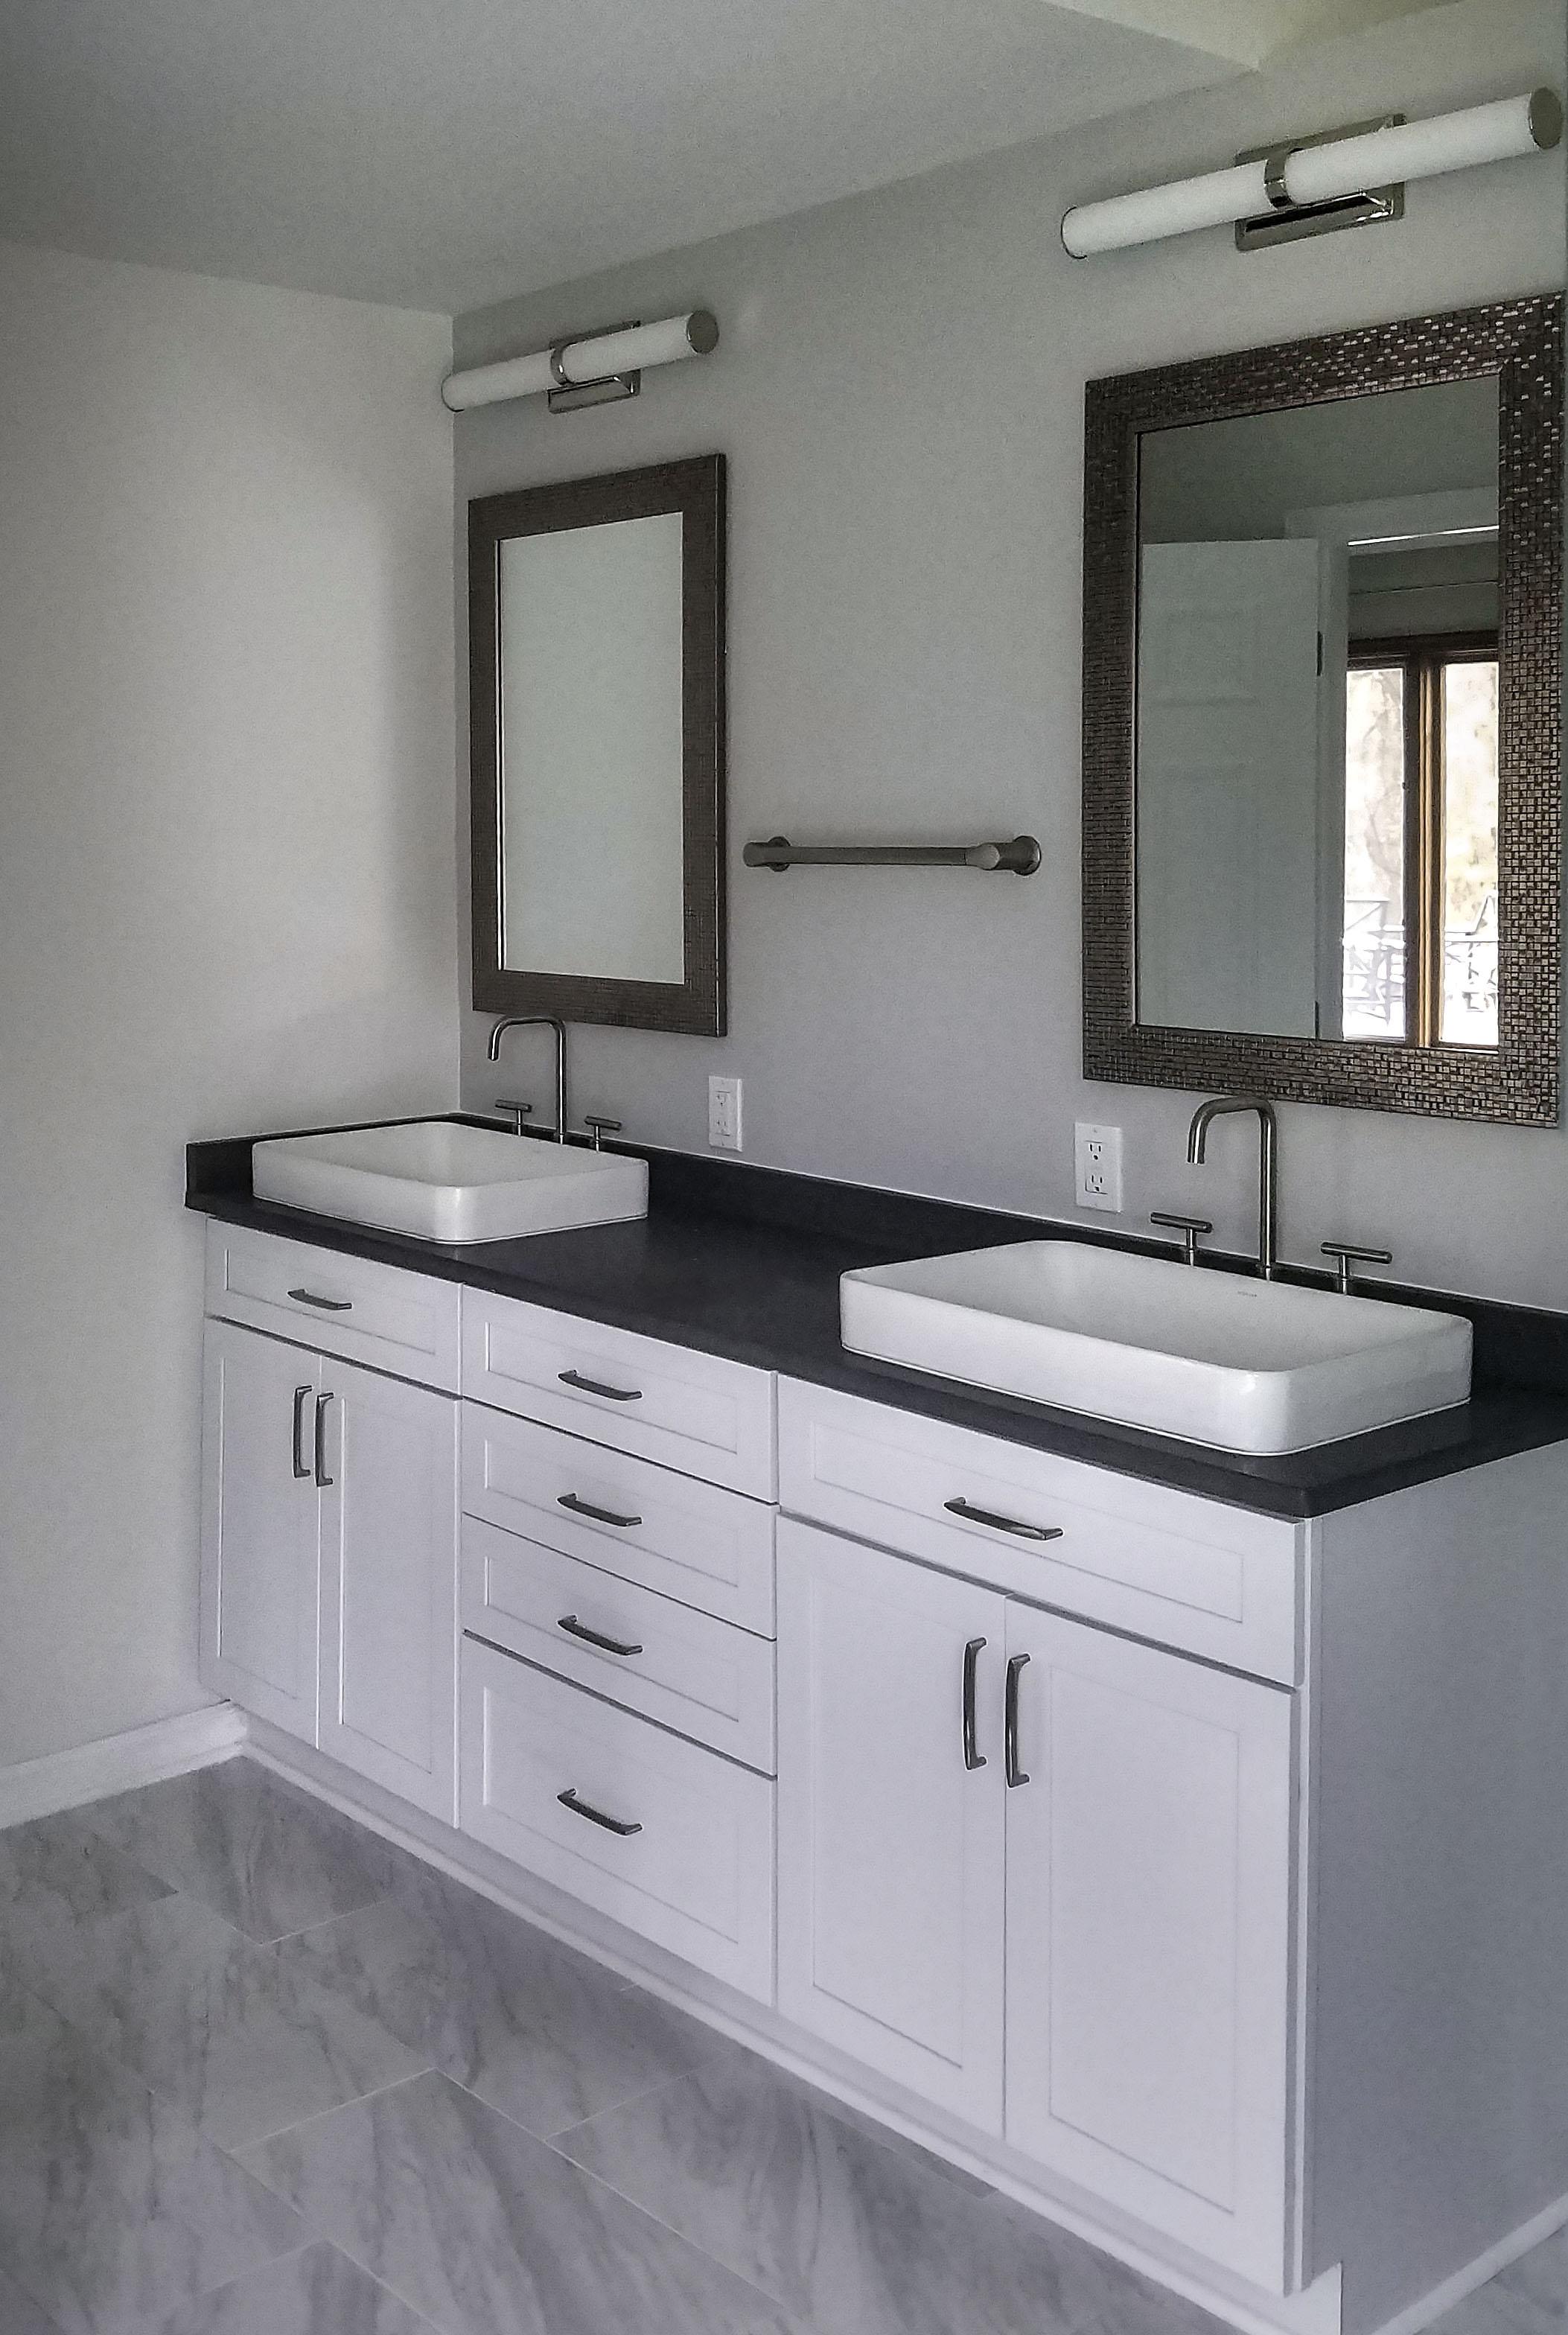 r2sr bathroom2 final edit.jpg